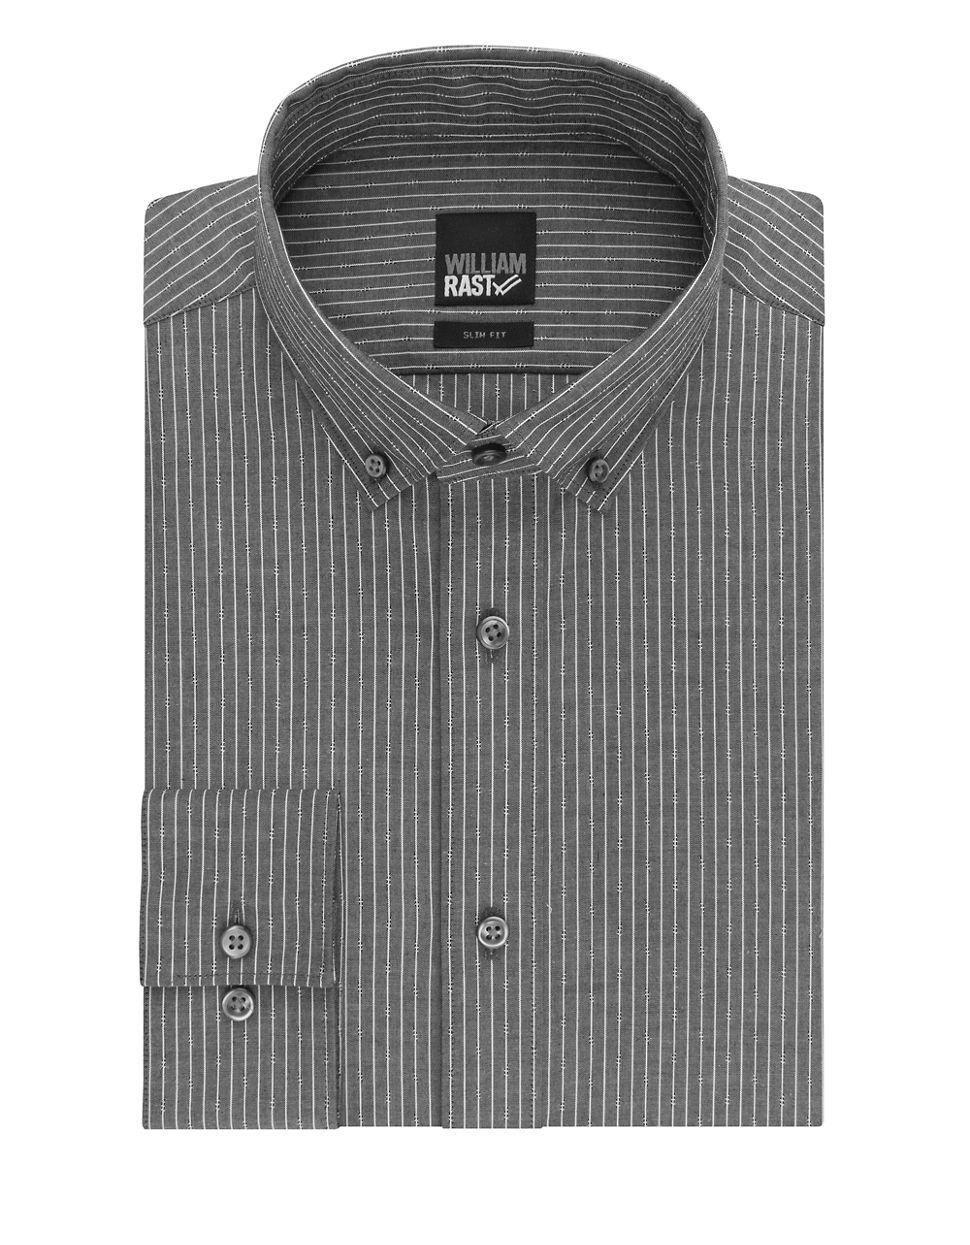 William rast striped button down shirt in gray for men lyst for Striped button down shirts for men